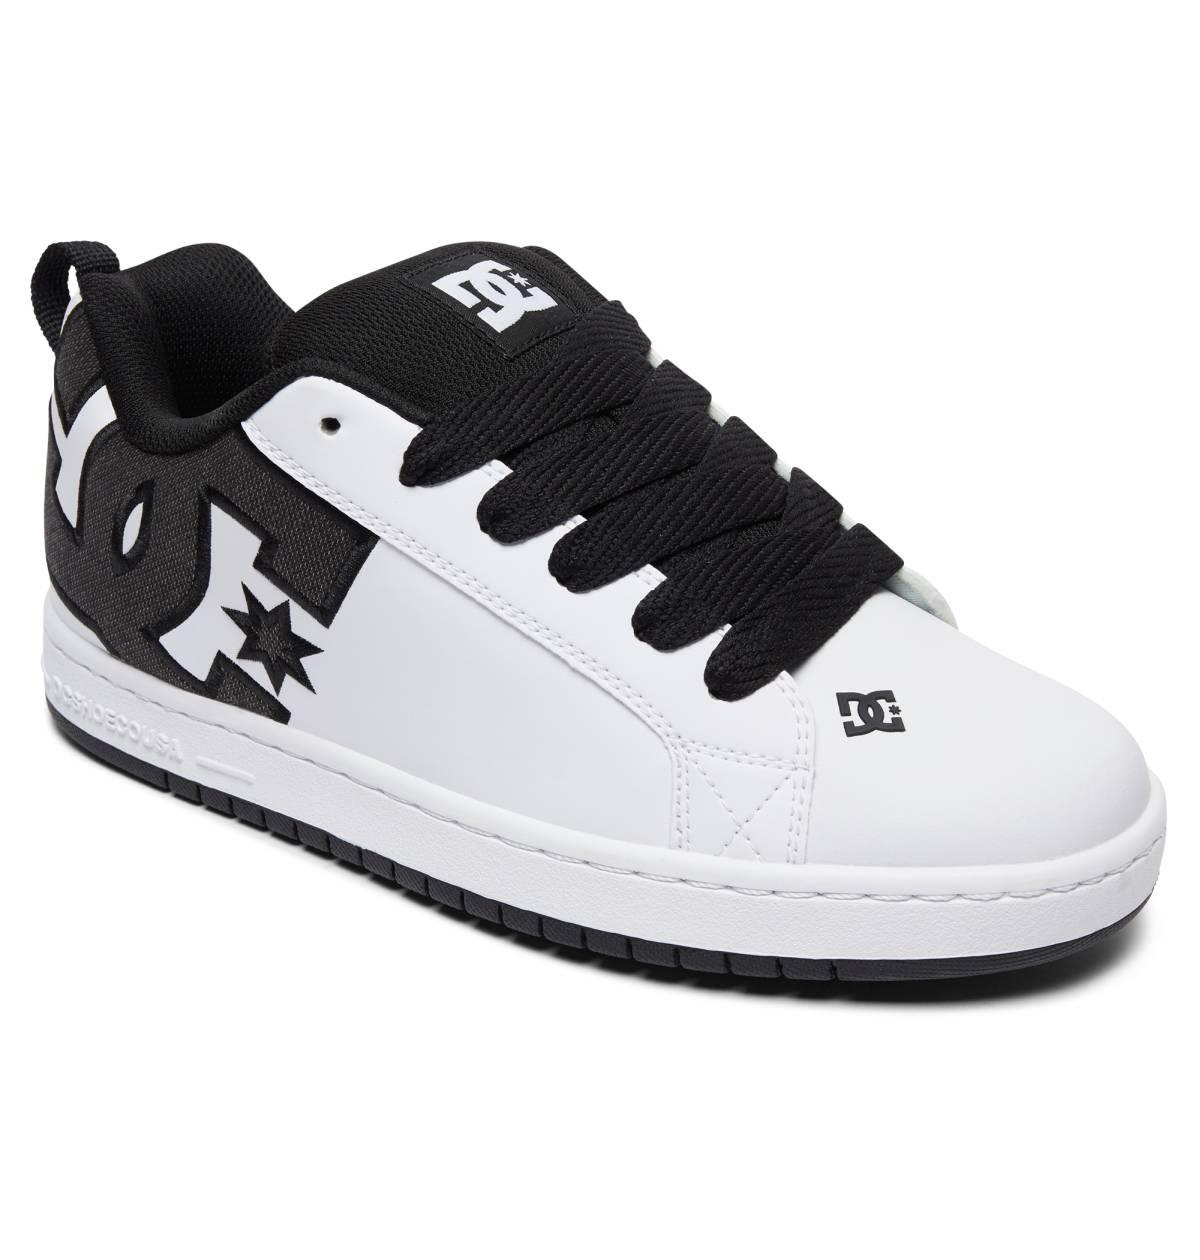 DC SHOES CT Graffik Sneaker Freizeitschuhe Skateschuhe schwarz Black White Leder